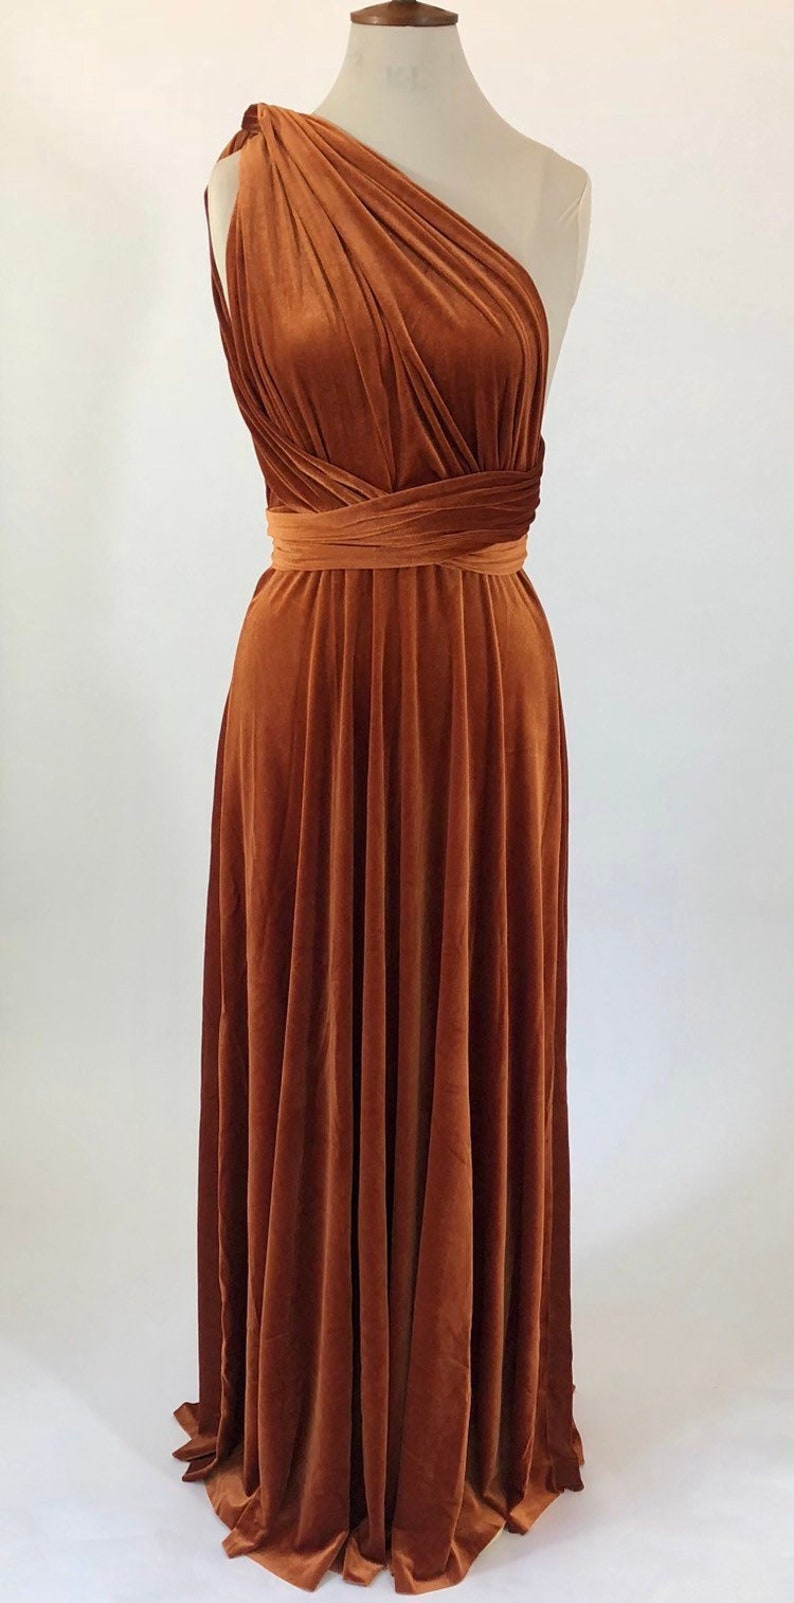 fdc6c7a3311 Copper bridesmaid dress rust multiway dress infinity dress